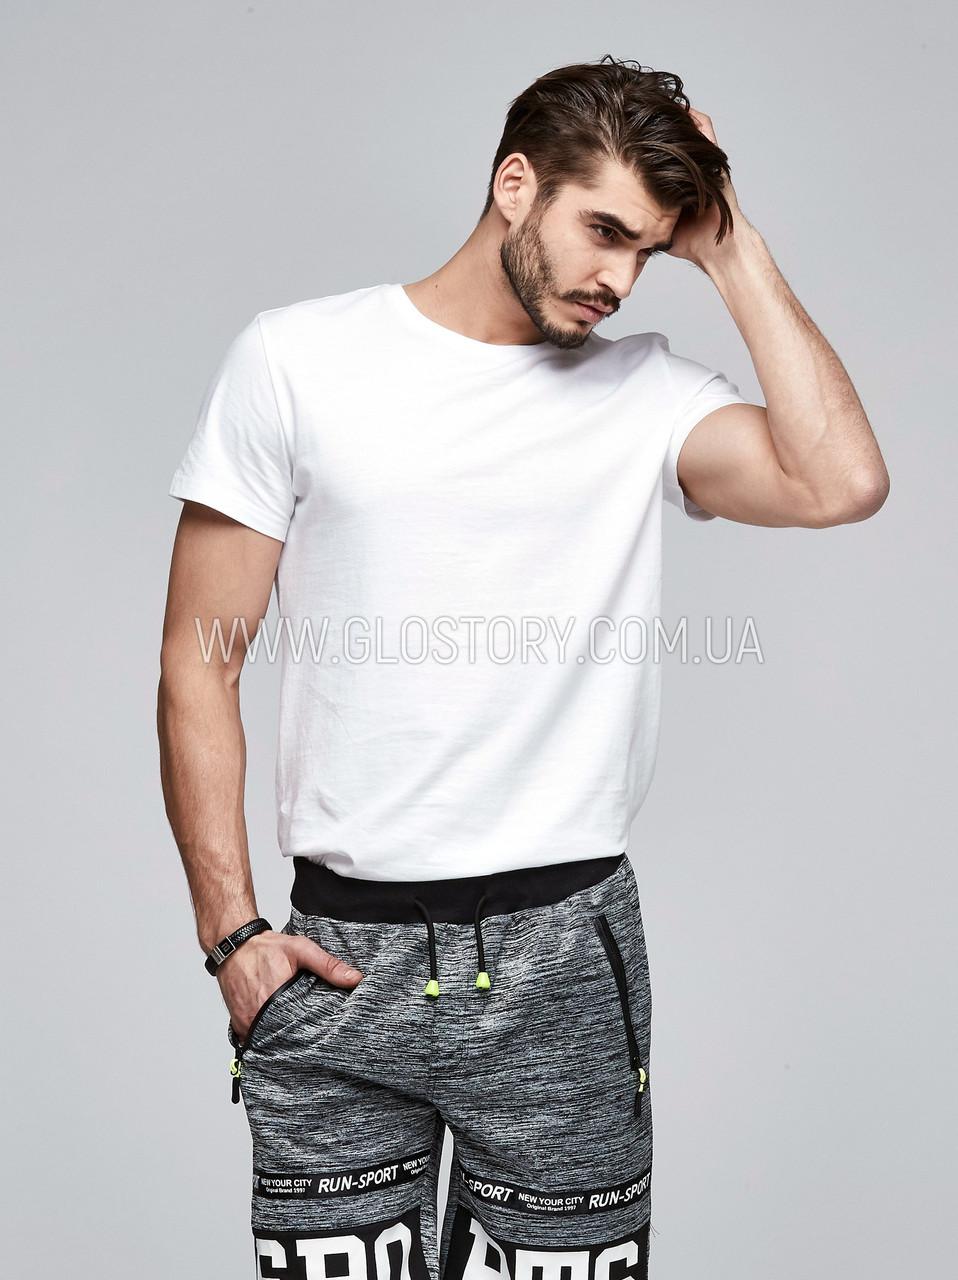 Мужская футболка Glo-Story